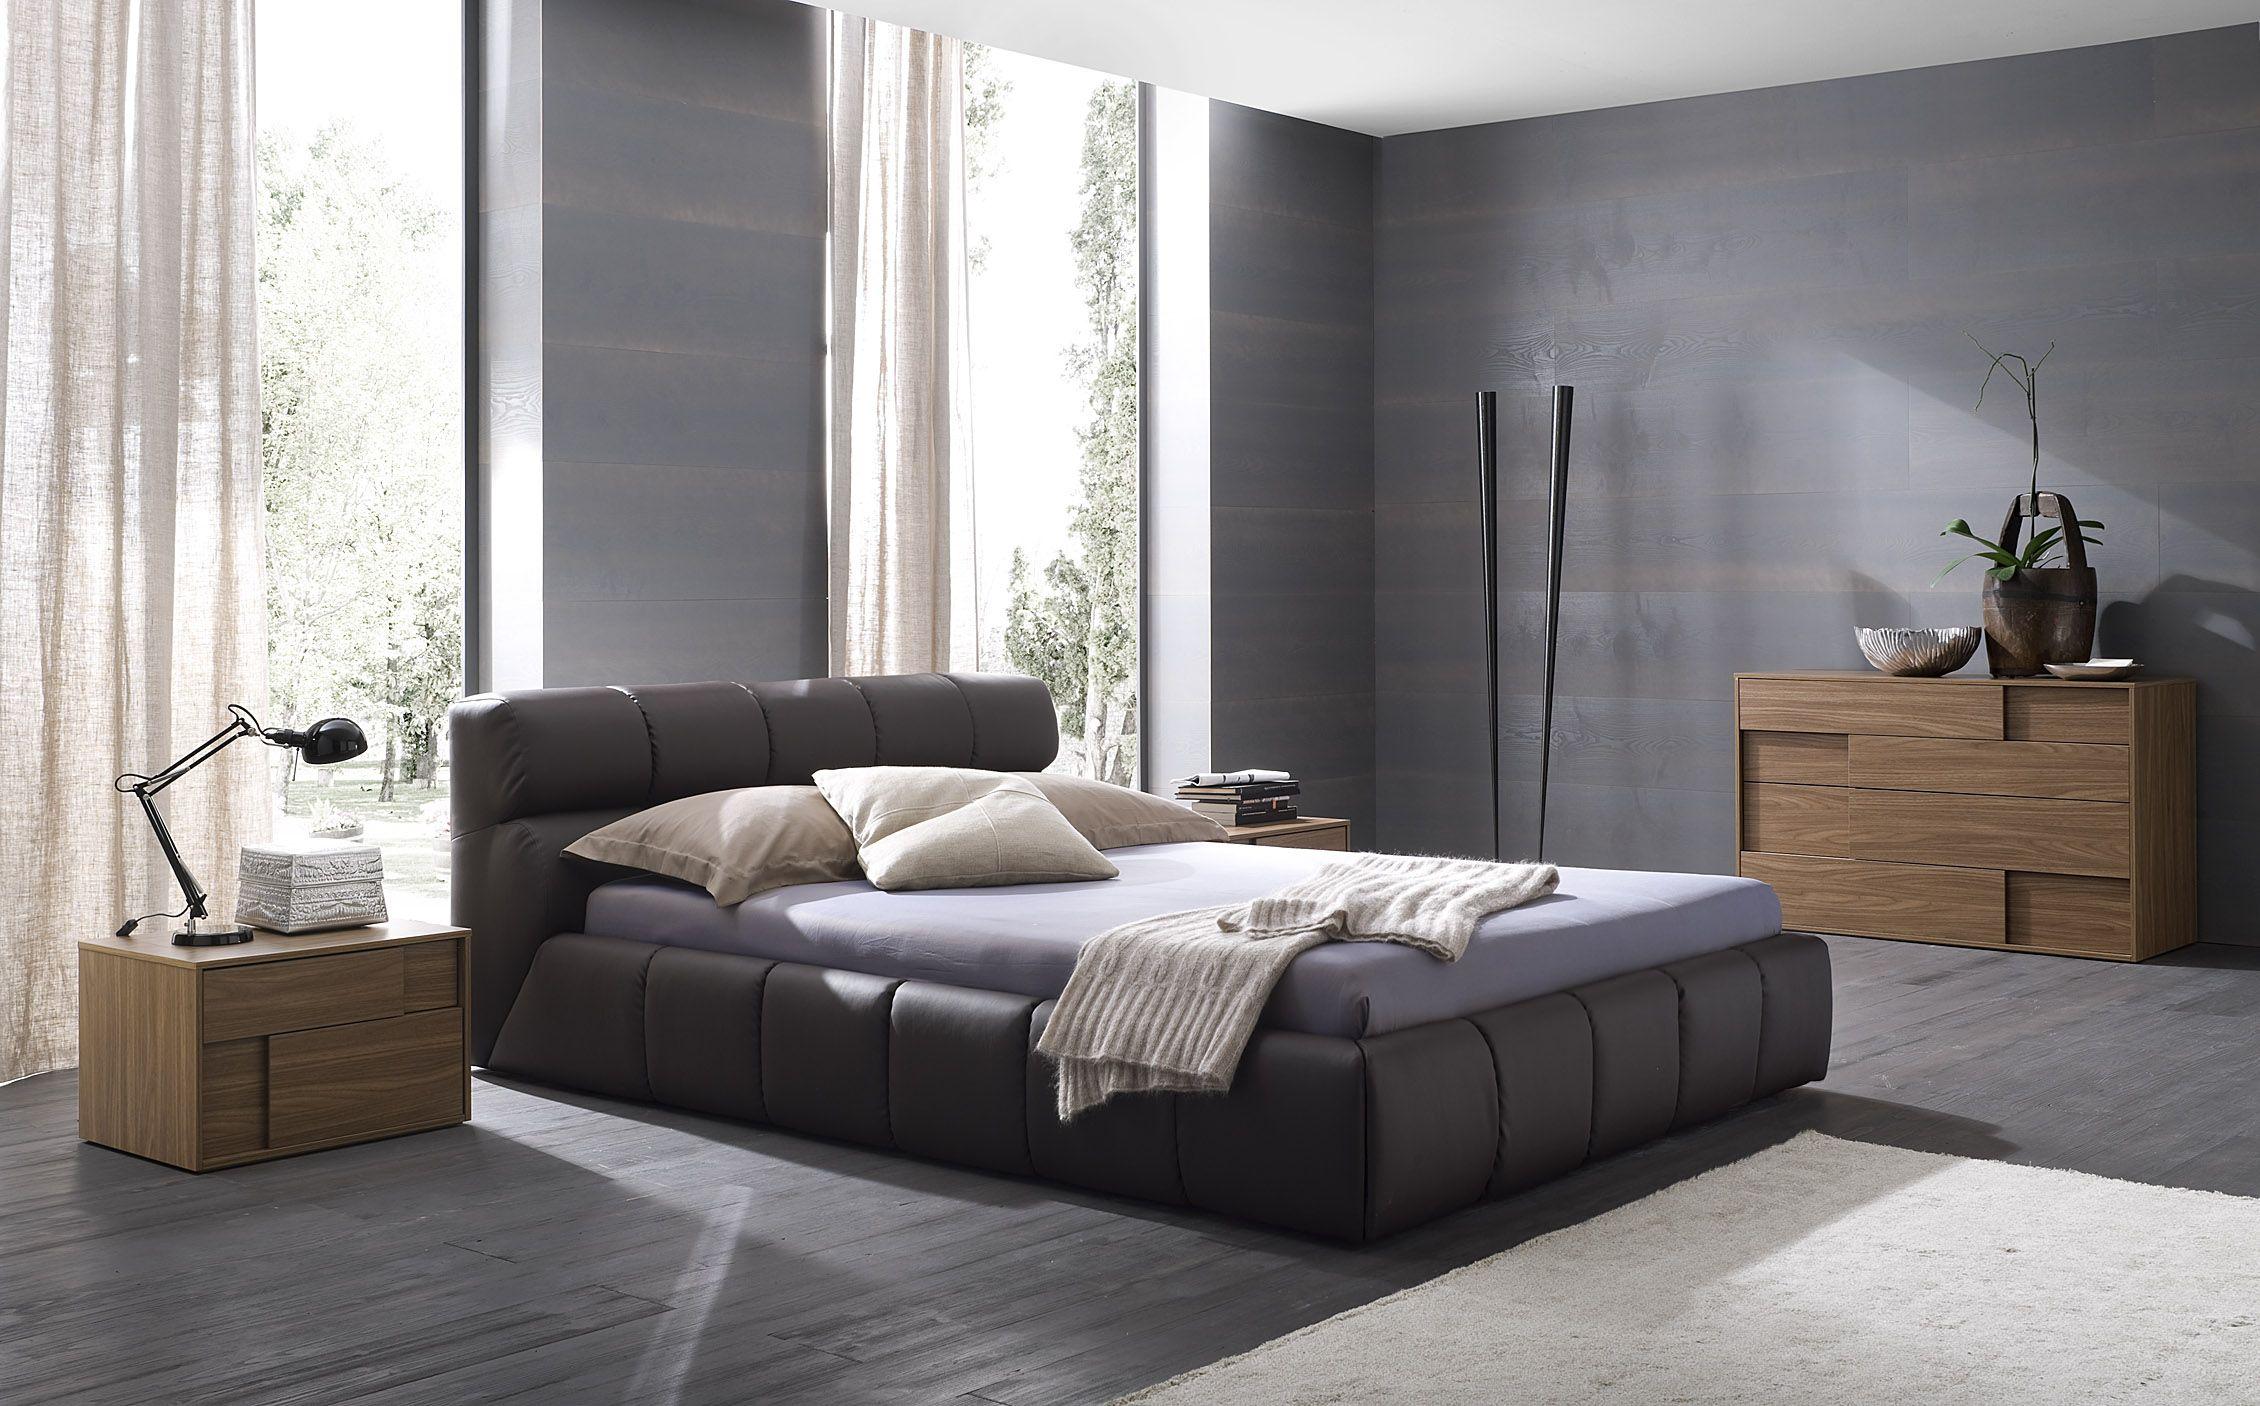 Best dark grey paint colors -  Temp